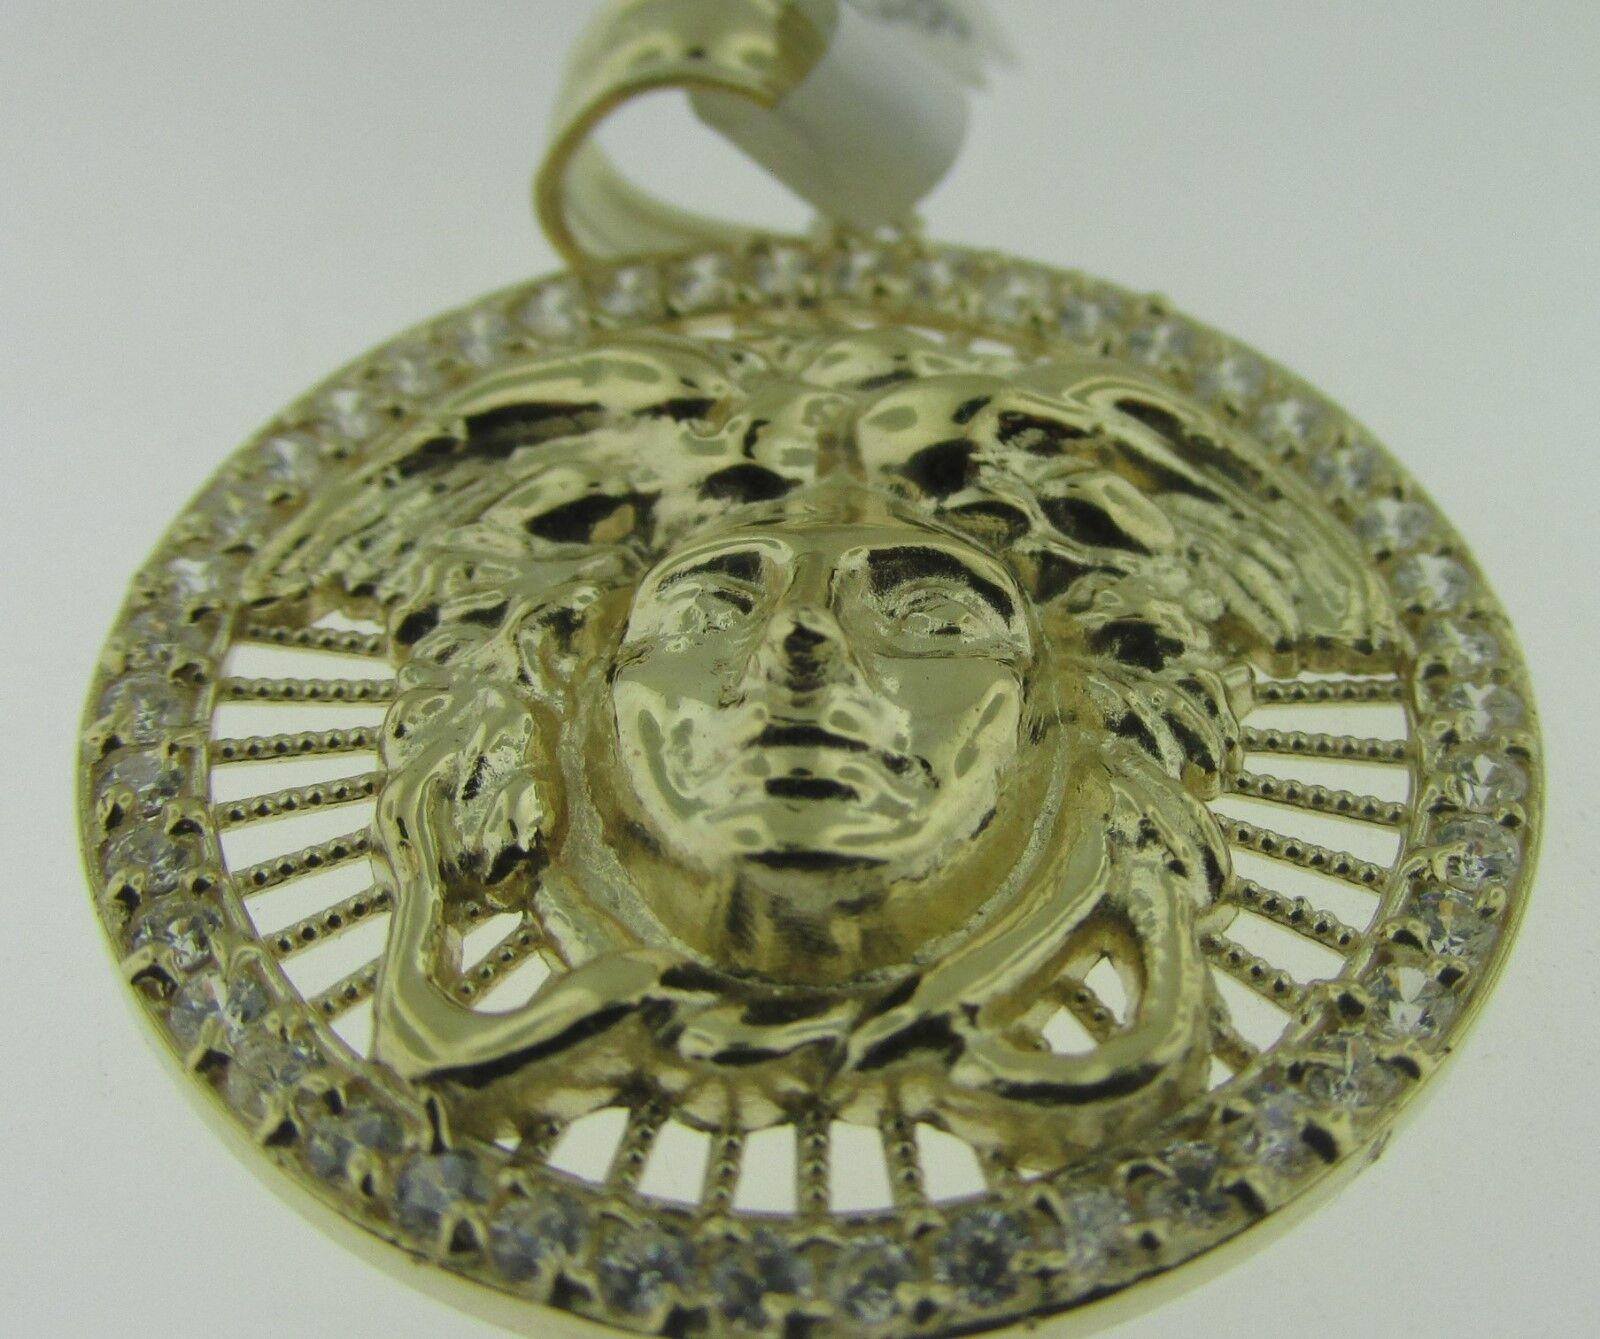 10kt Yellow gold CZ Medusa Head Medallion Charm Pendant 1.35  3.8 gms